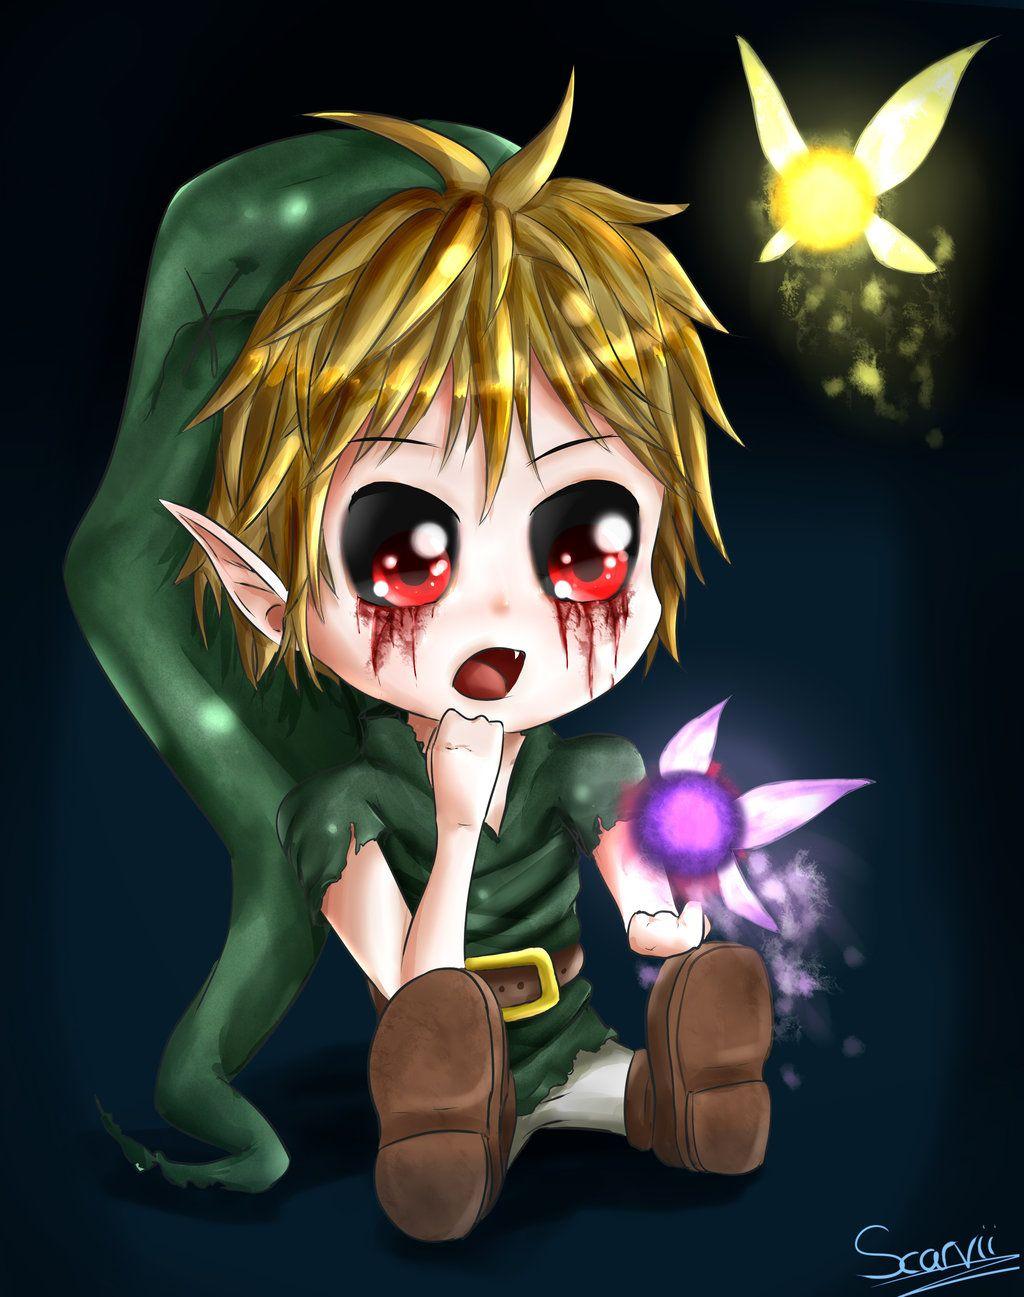 anime neko girl kawaii creepypasta - Google Search | cute ...